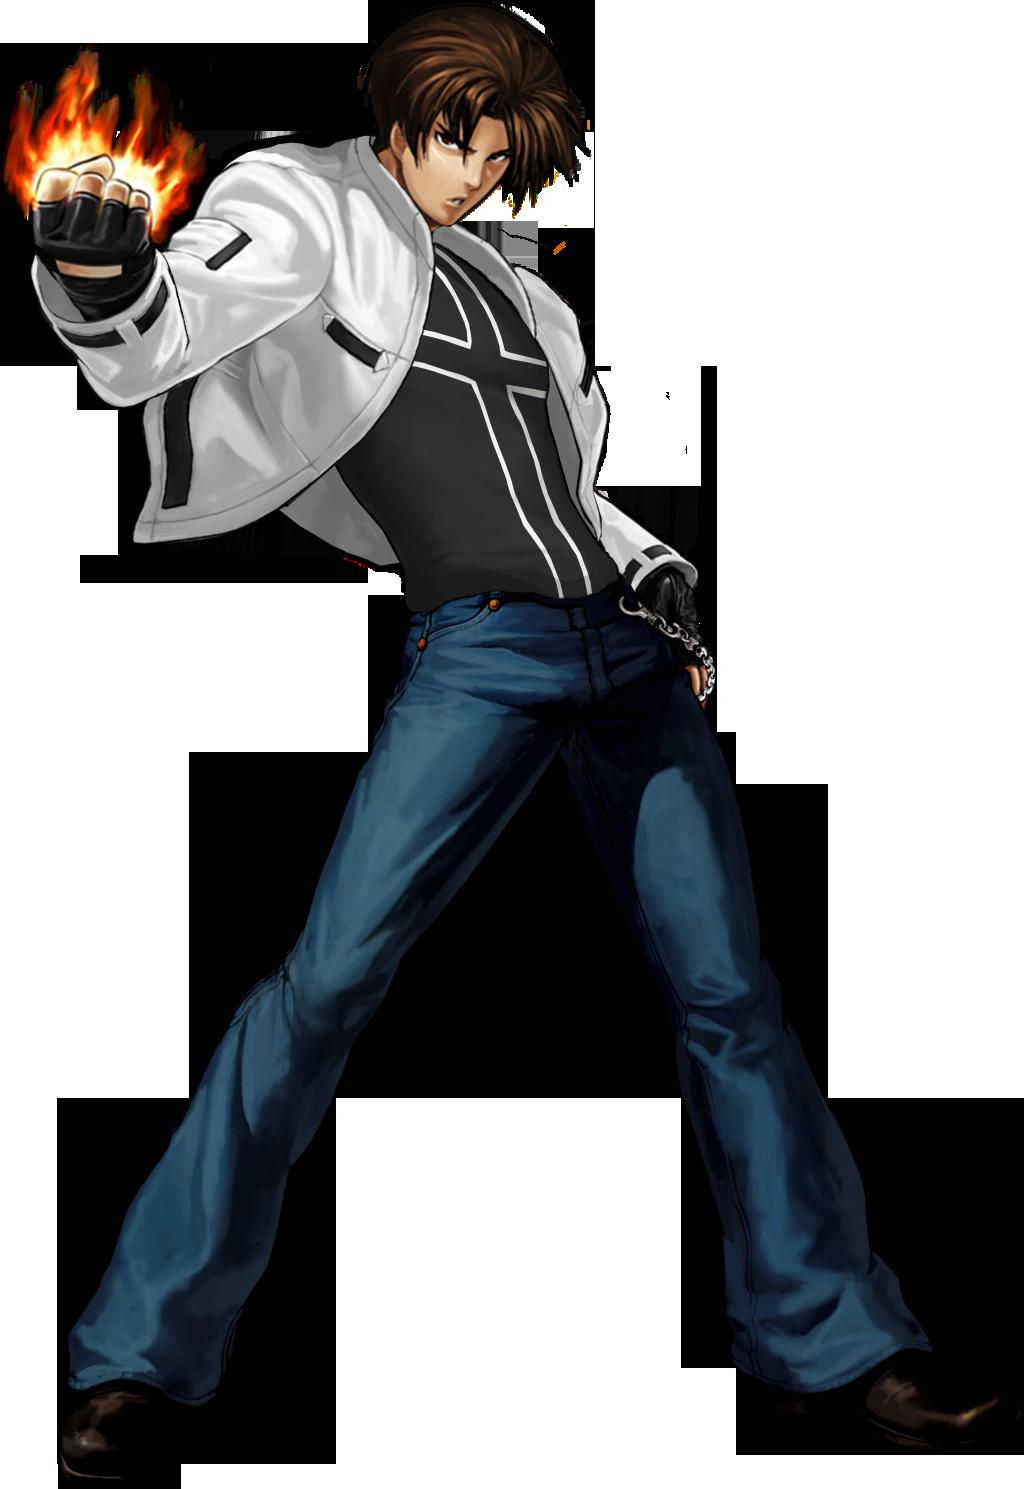 Kyo Kusanagi NESTS KOF XIII by OrochiDarkKyo 1024x1489